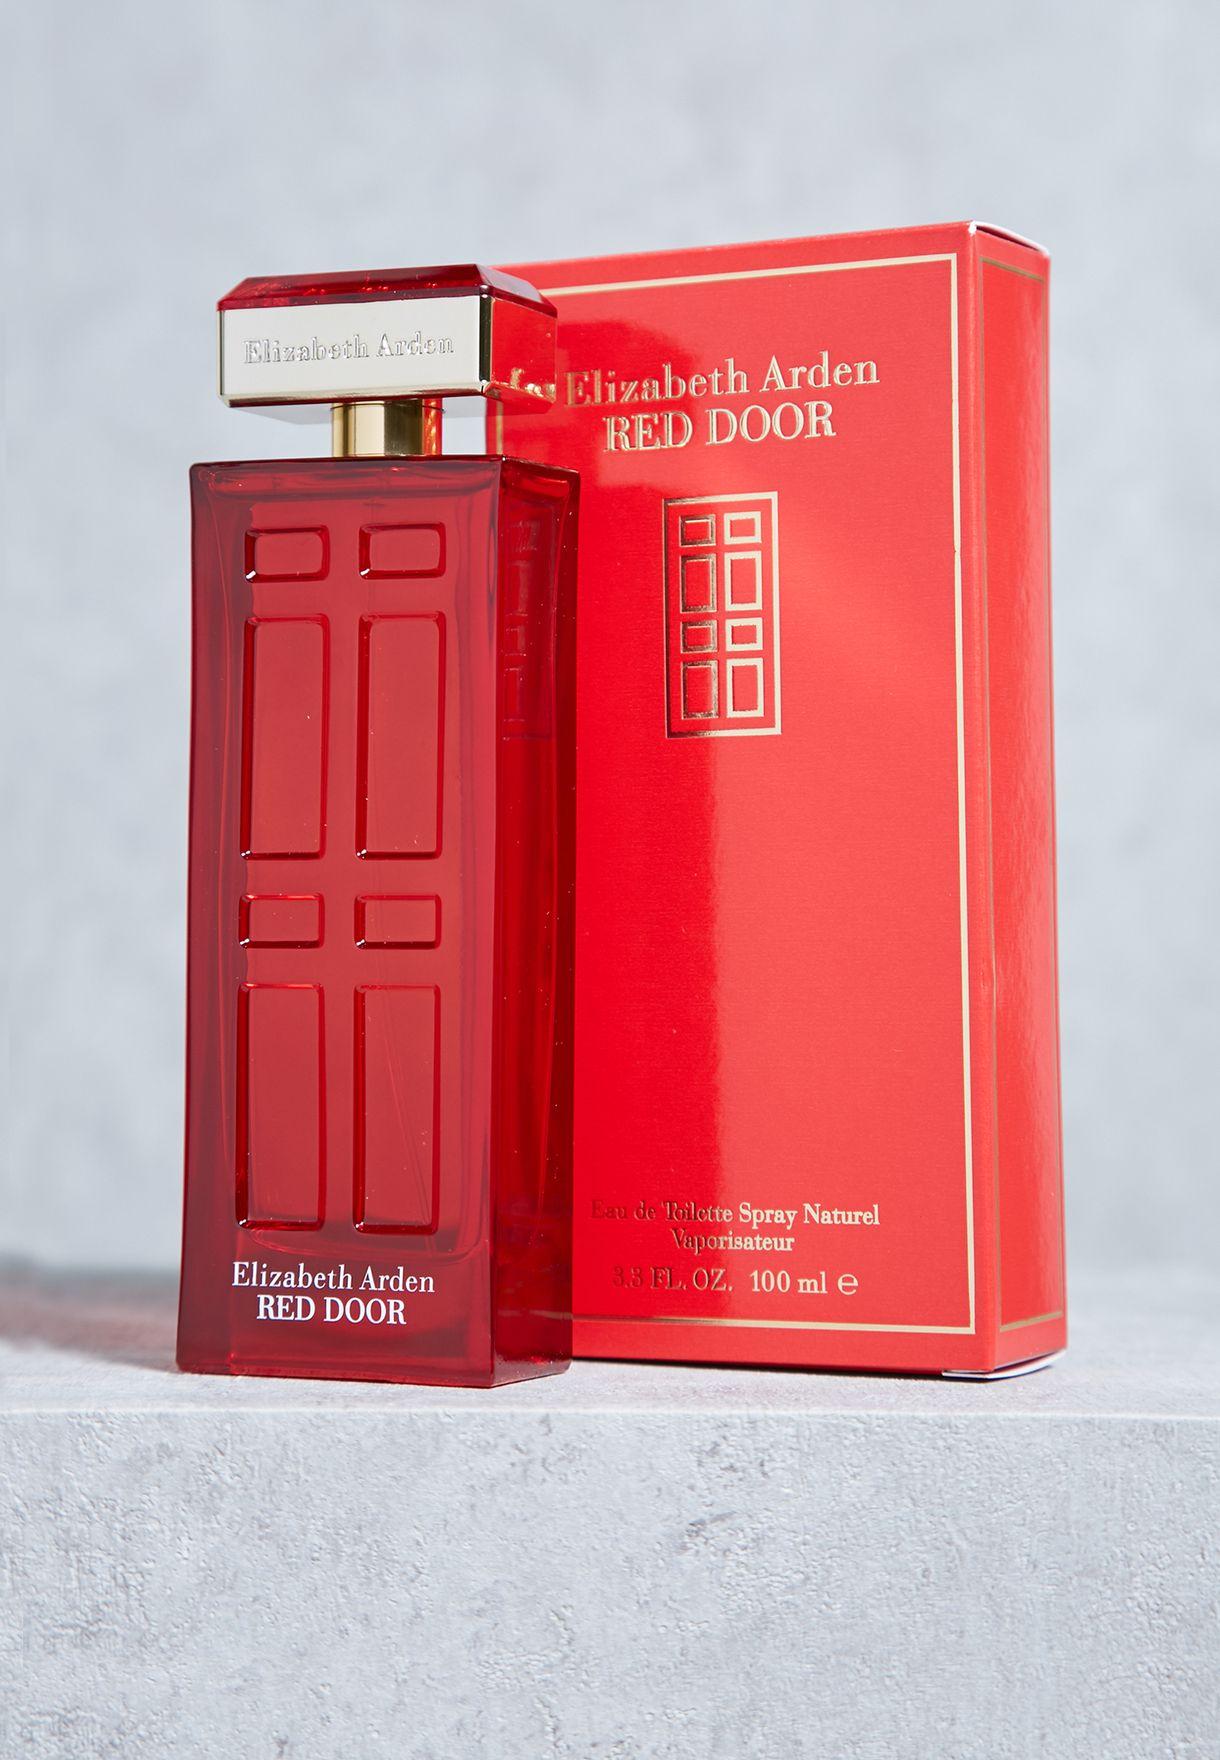 d7f85d374 تسوق عطر ريد دوور 100 مل ماركة اليزابيث اردن لون شفاف 85805558420 في ...